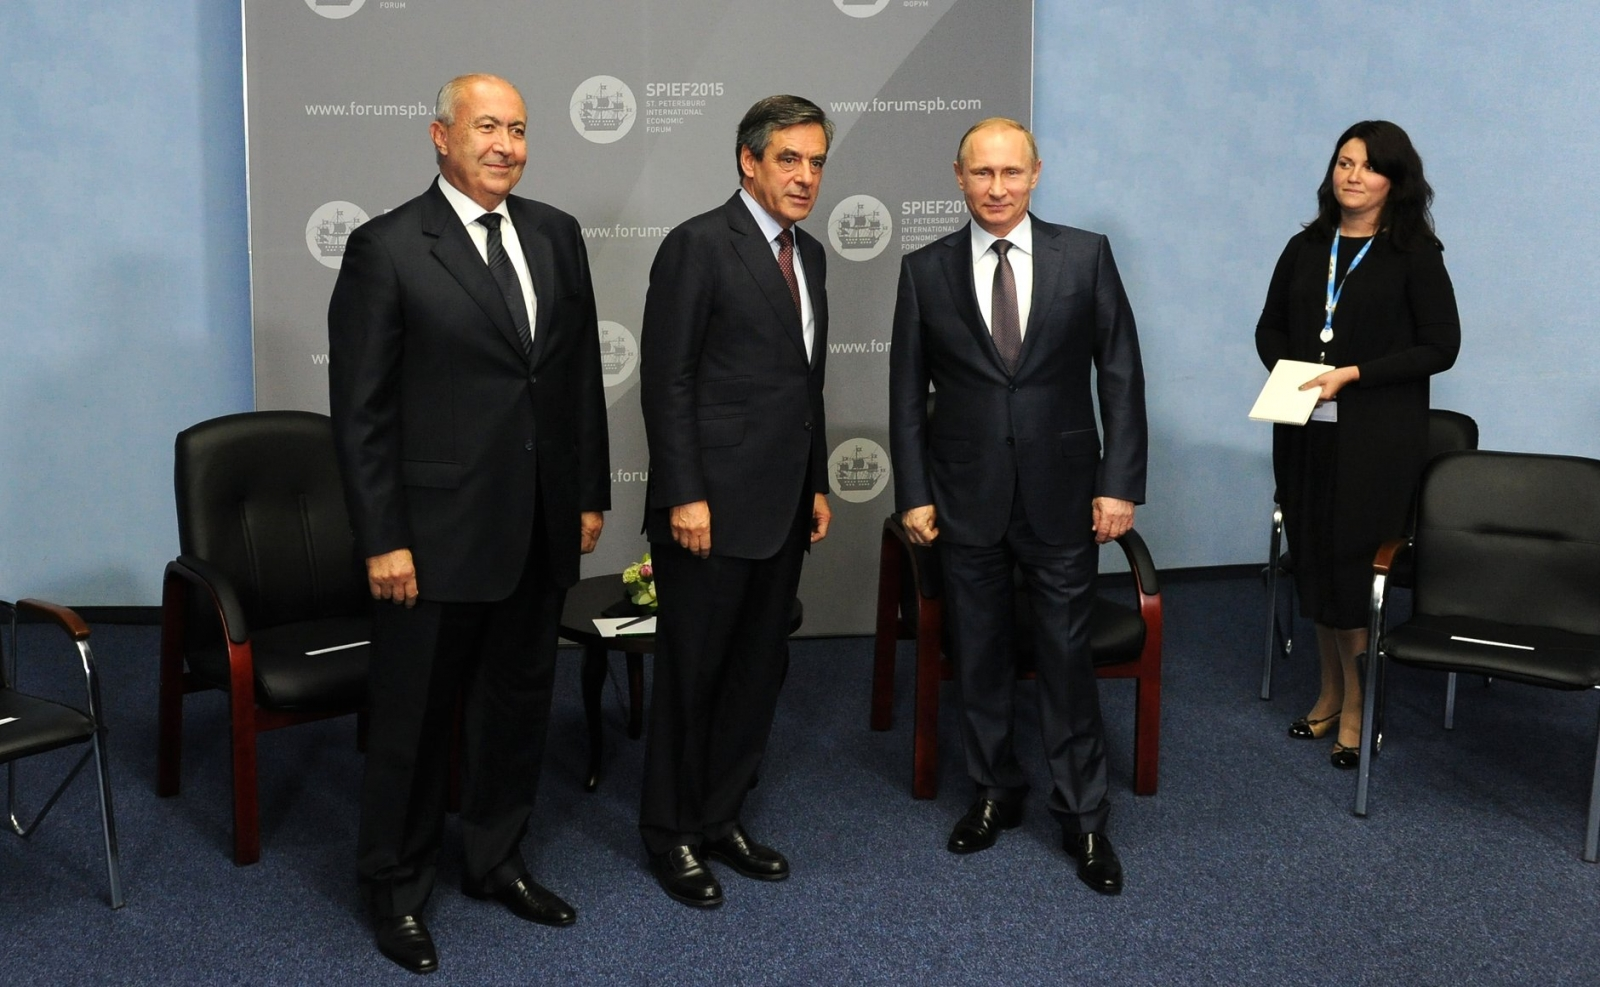 Fillon meets Putin at SPIEF 2015